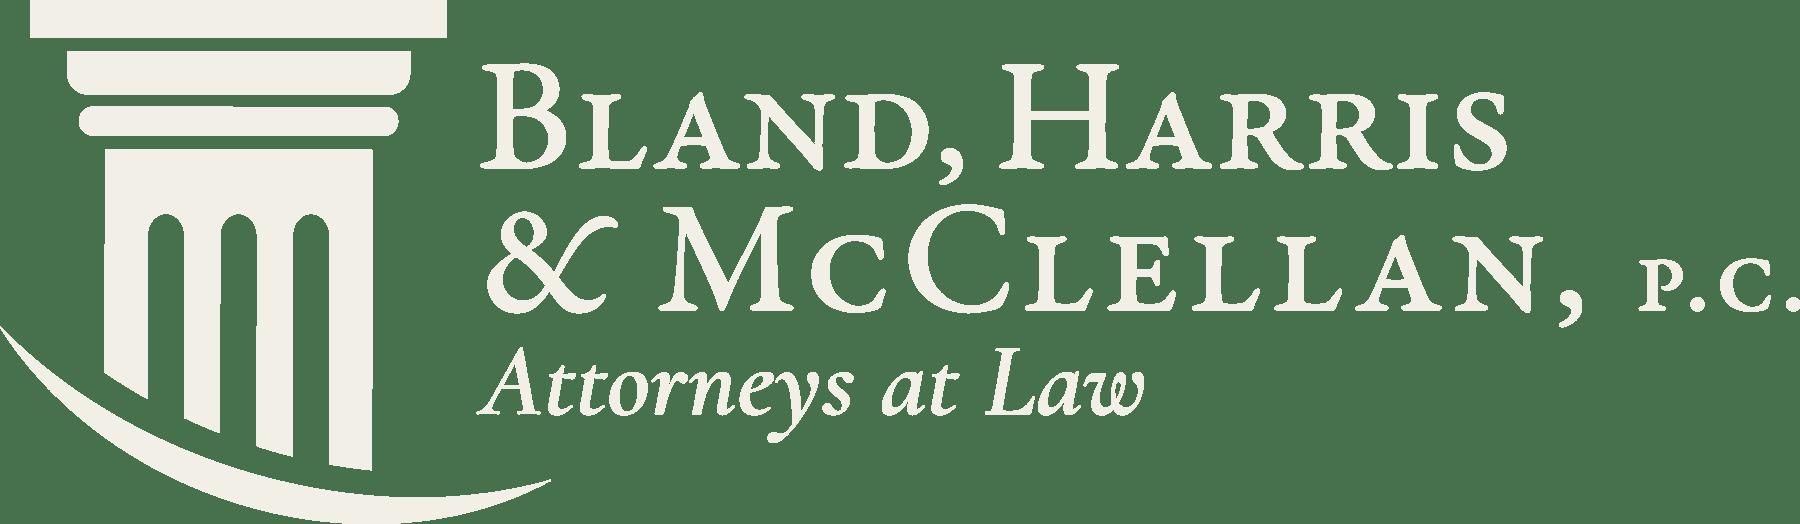 Bland, Harris, & McClellan, P.C.